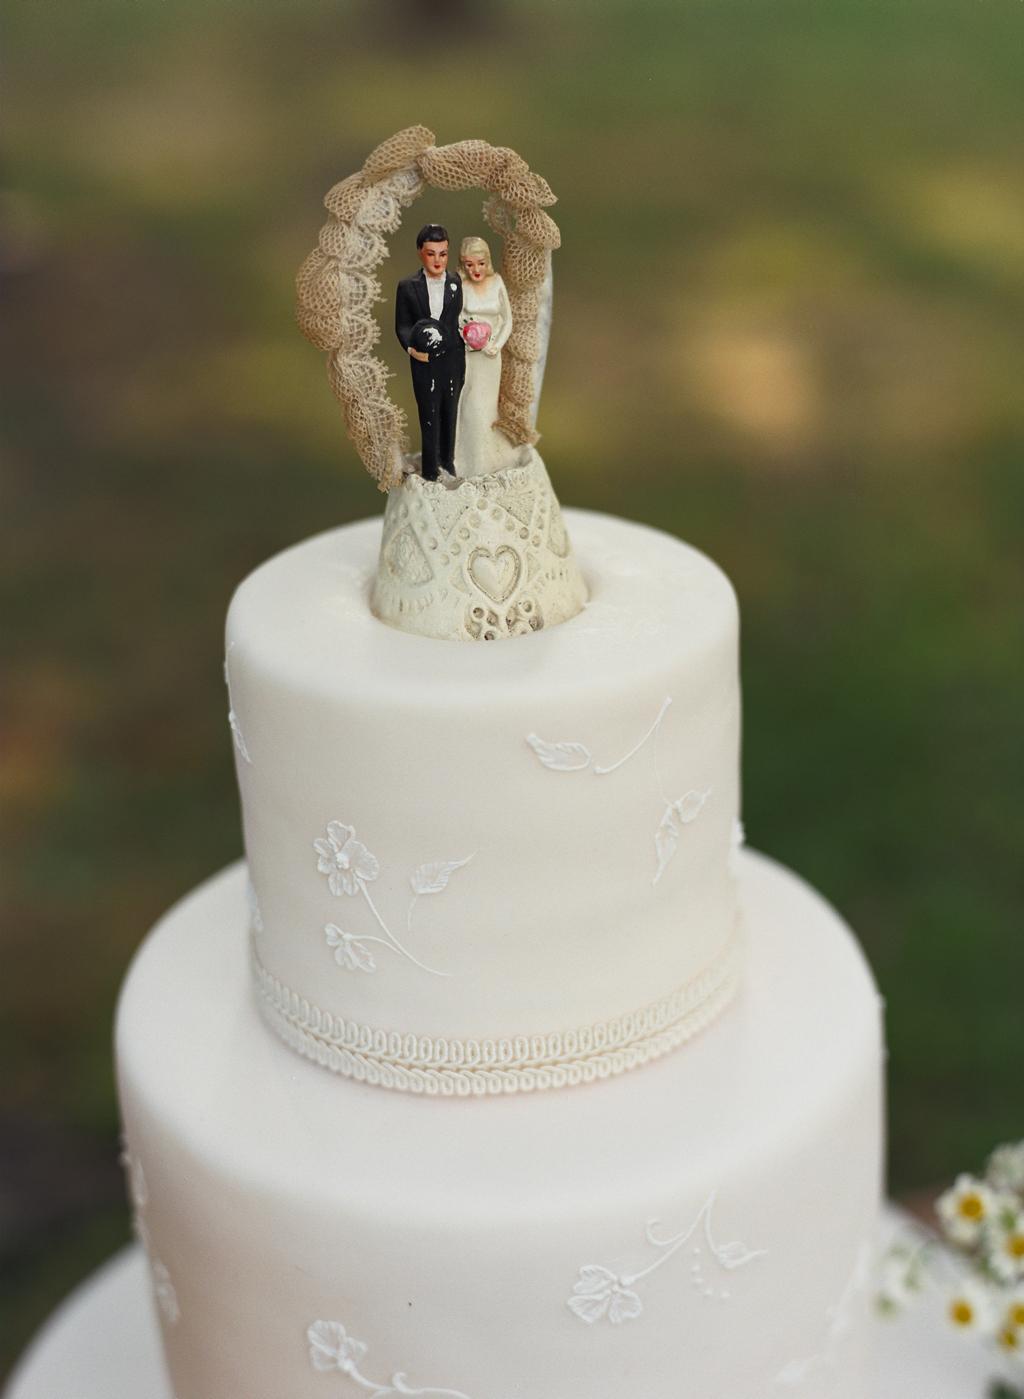 Silver Drip Wedding Cake 25th Wedding Anniversary Cakes Silver